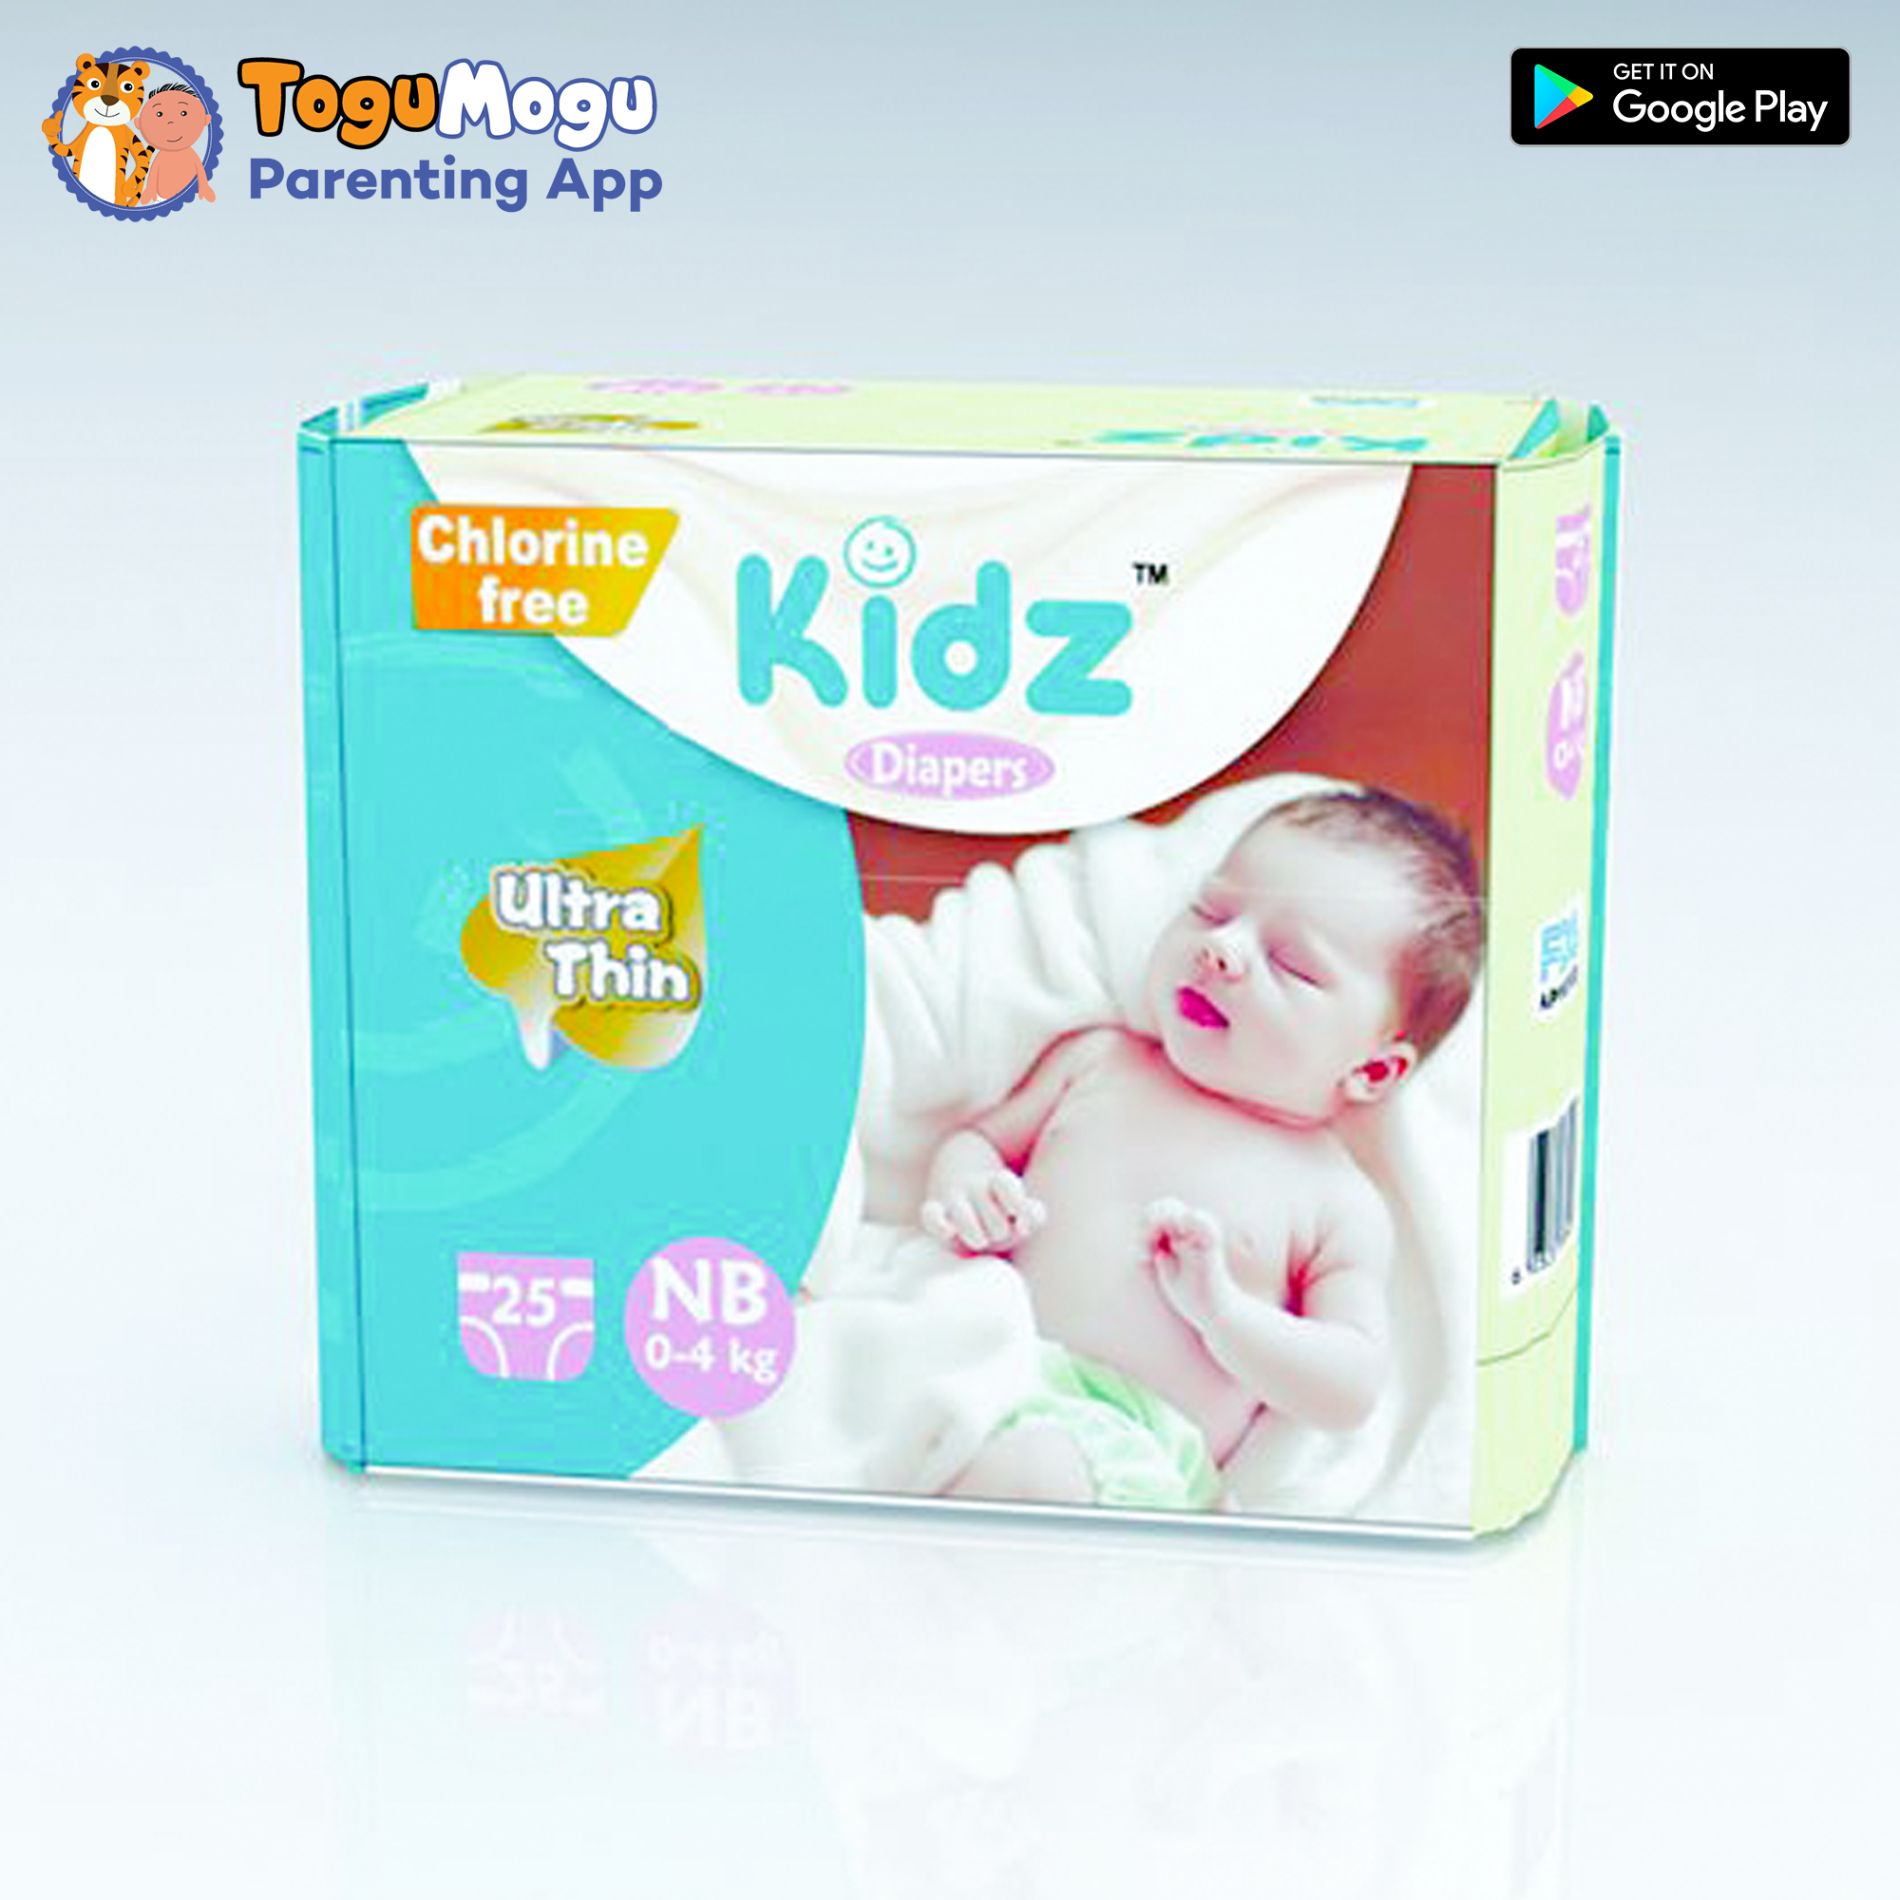 Kidz Diapers NB (0-4kg) 12Pcs